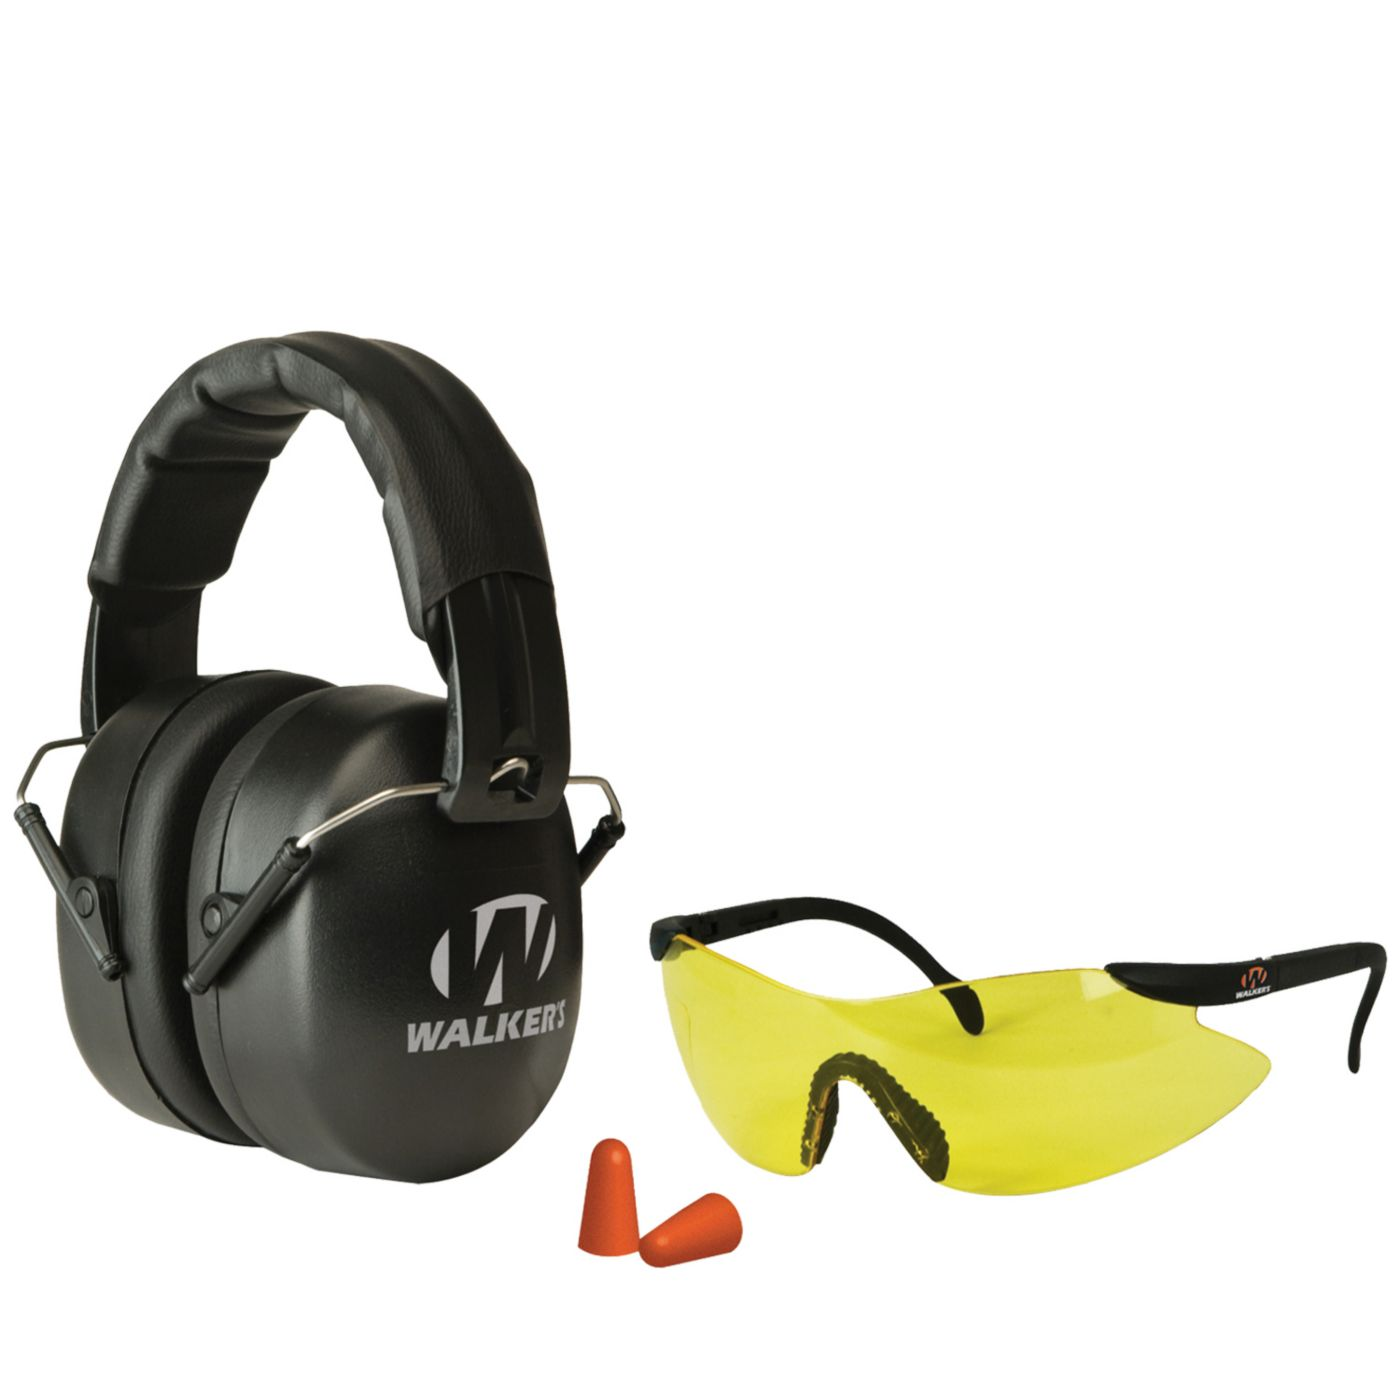 Walker's Game Ear EXT Range Folding Shooting Earmuffs and Glasses Combo